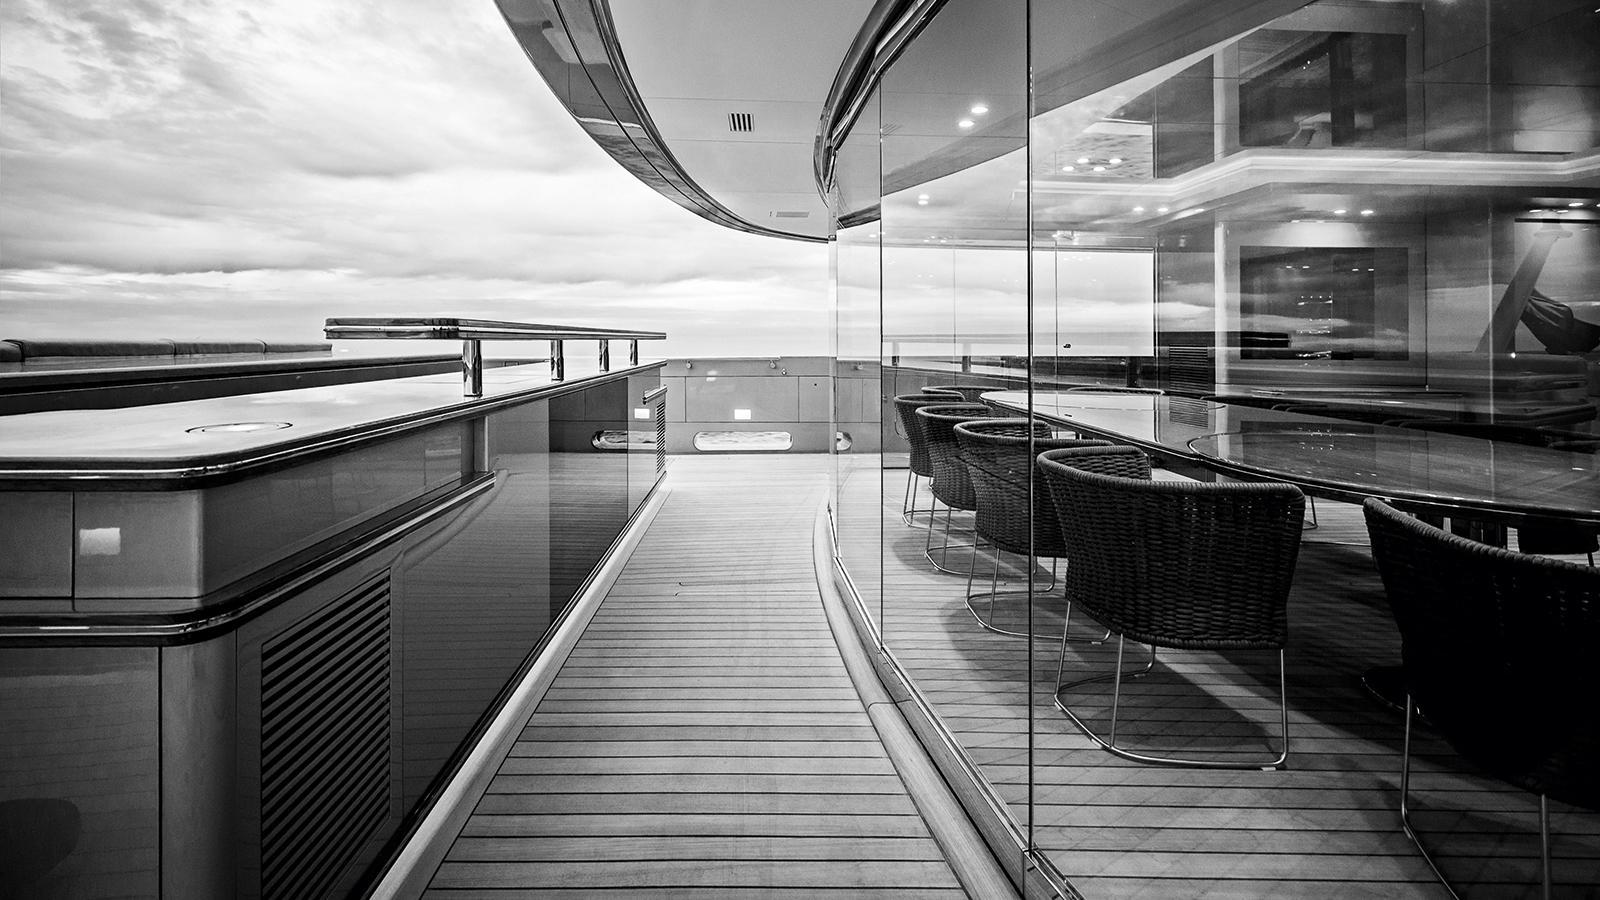 silver-fast-motor-yacht-2015-77m-indoor-outdoor